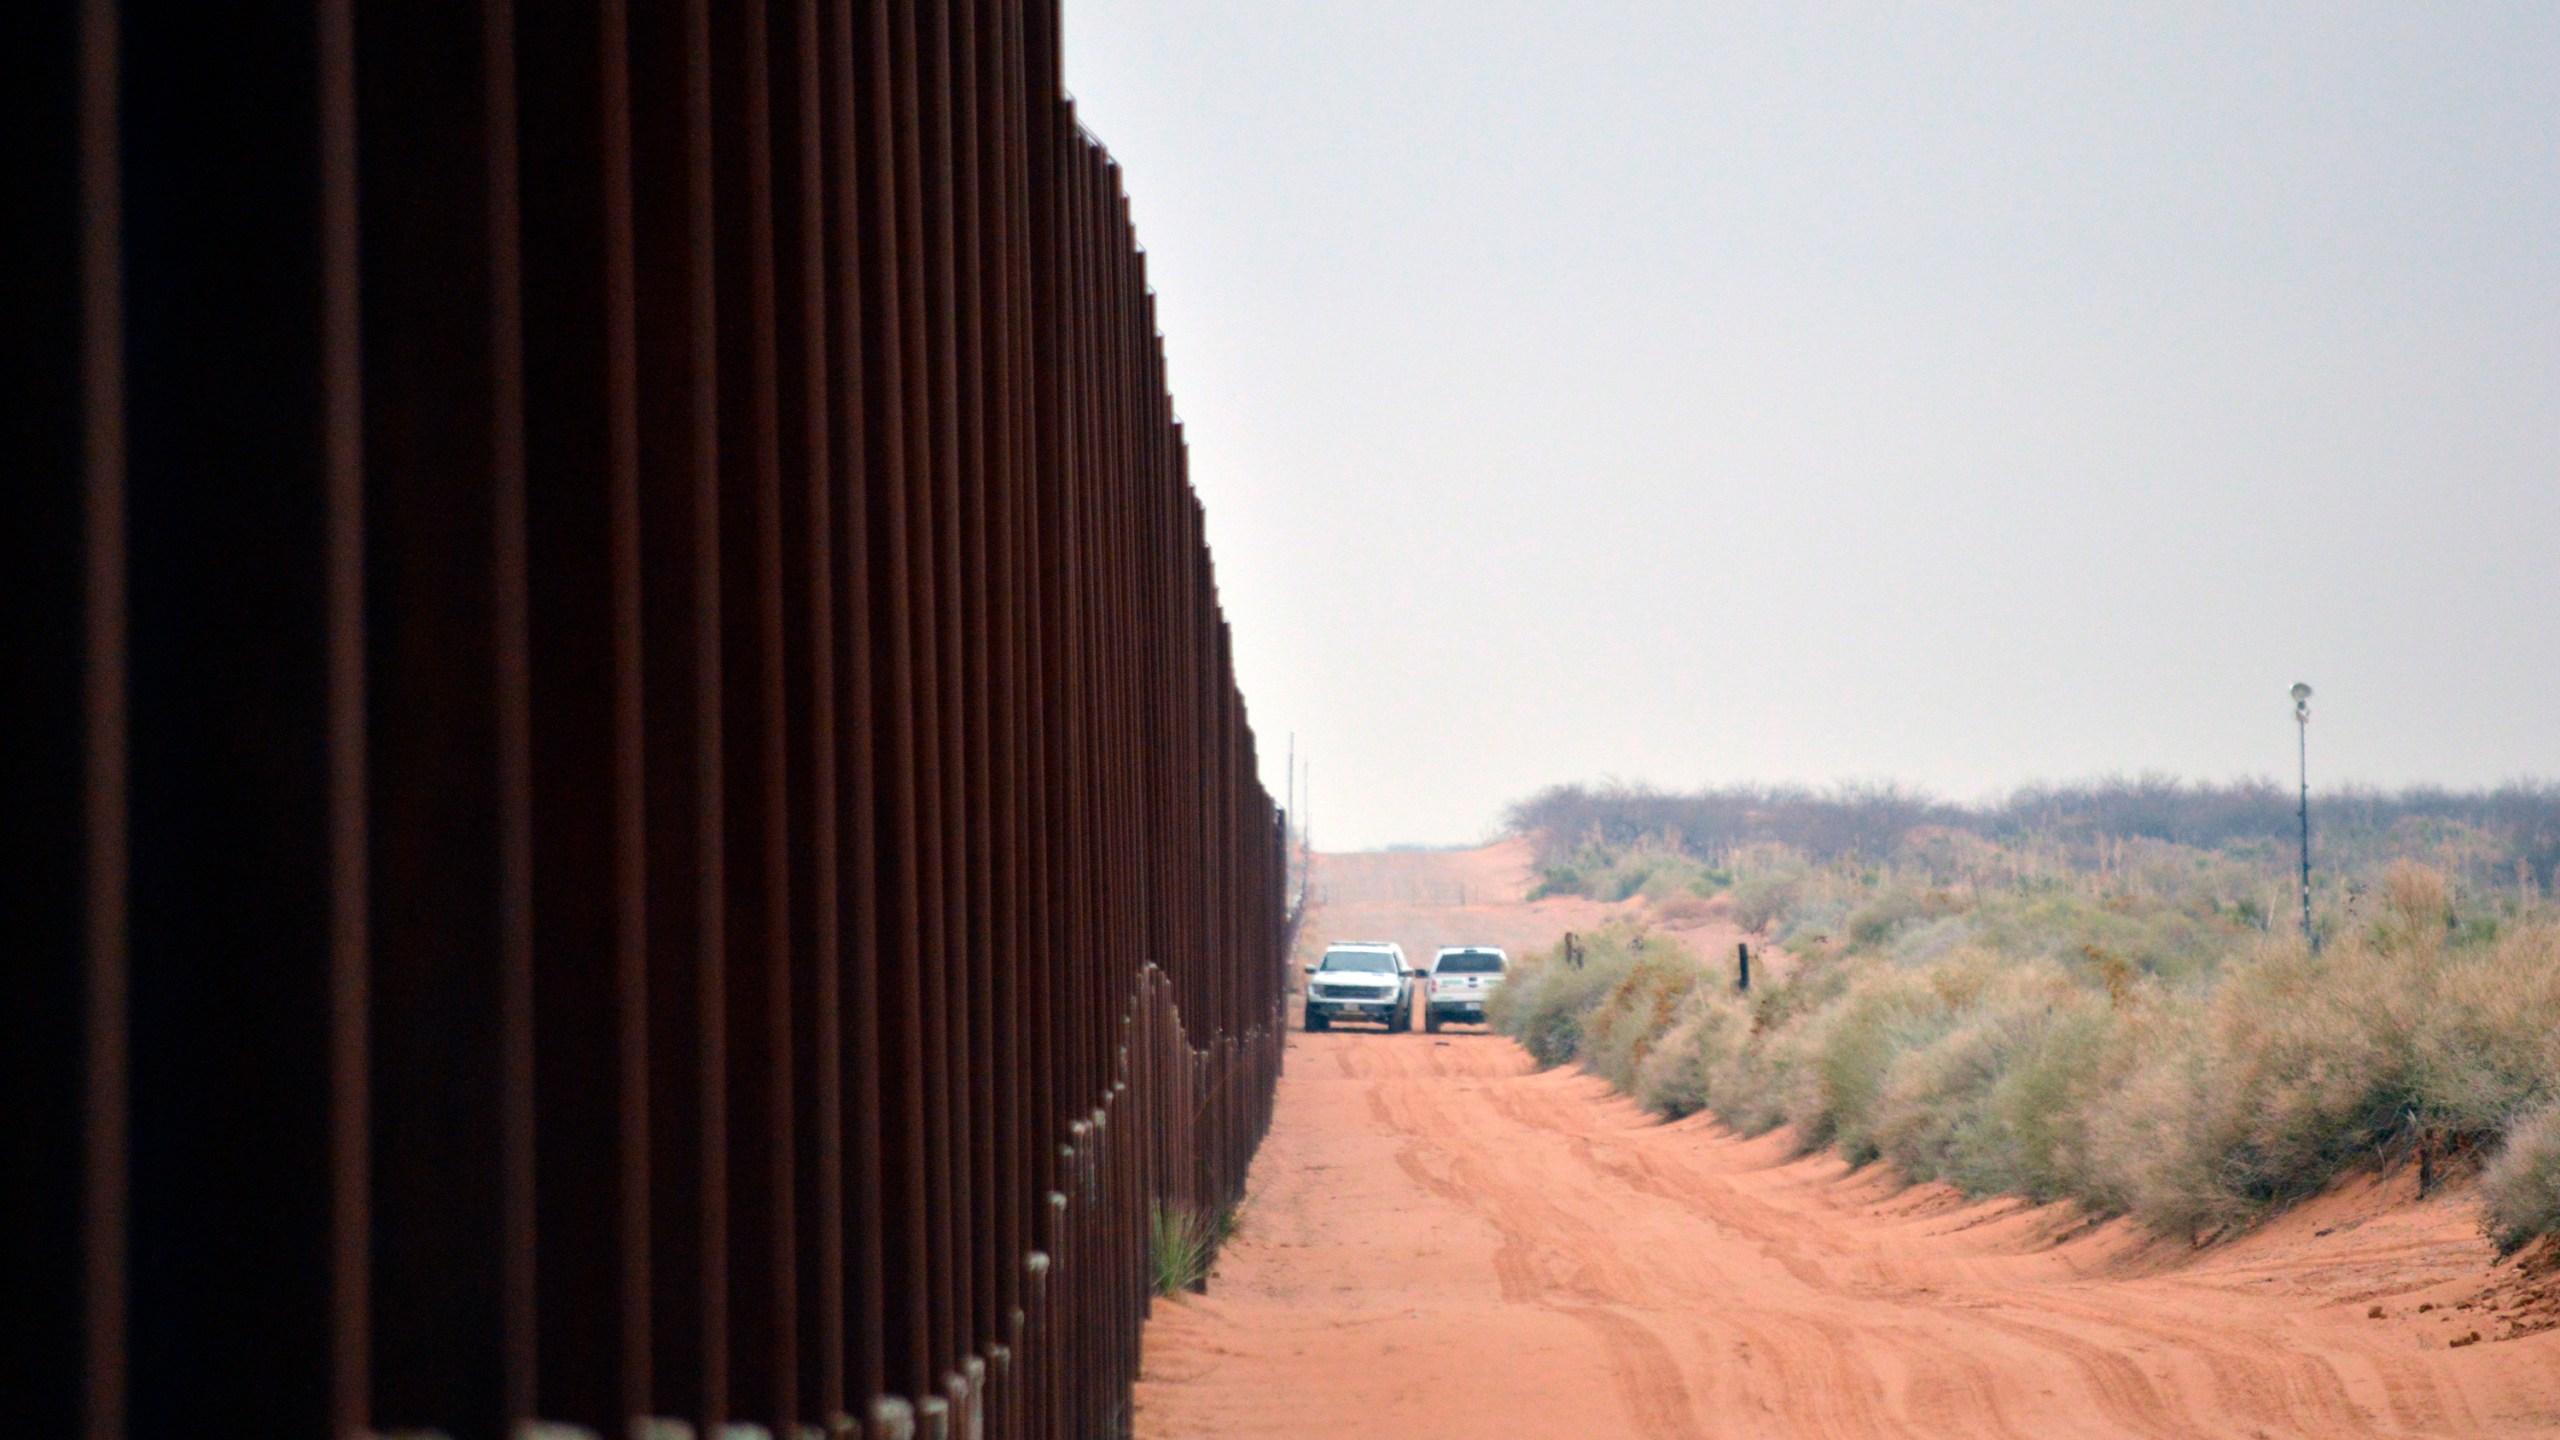 Border_Wall_51665-159532.jpg23164527